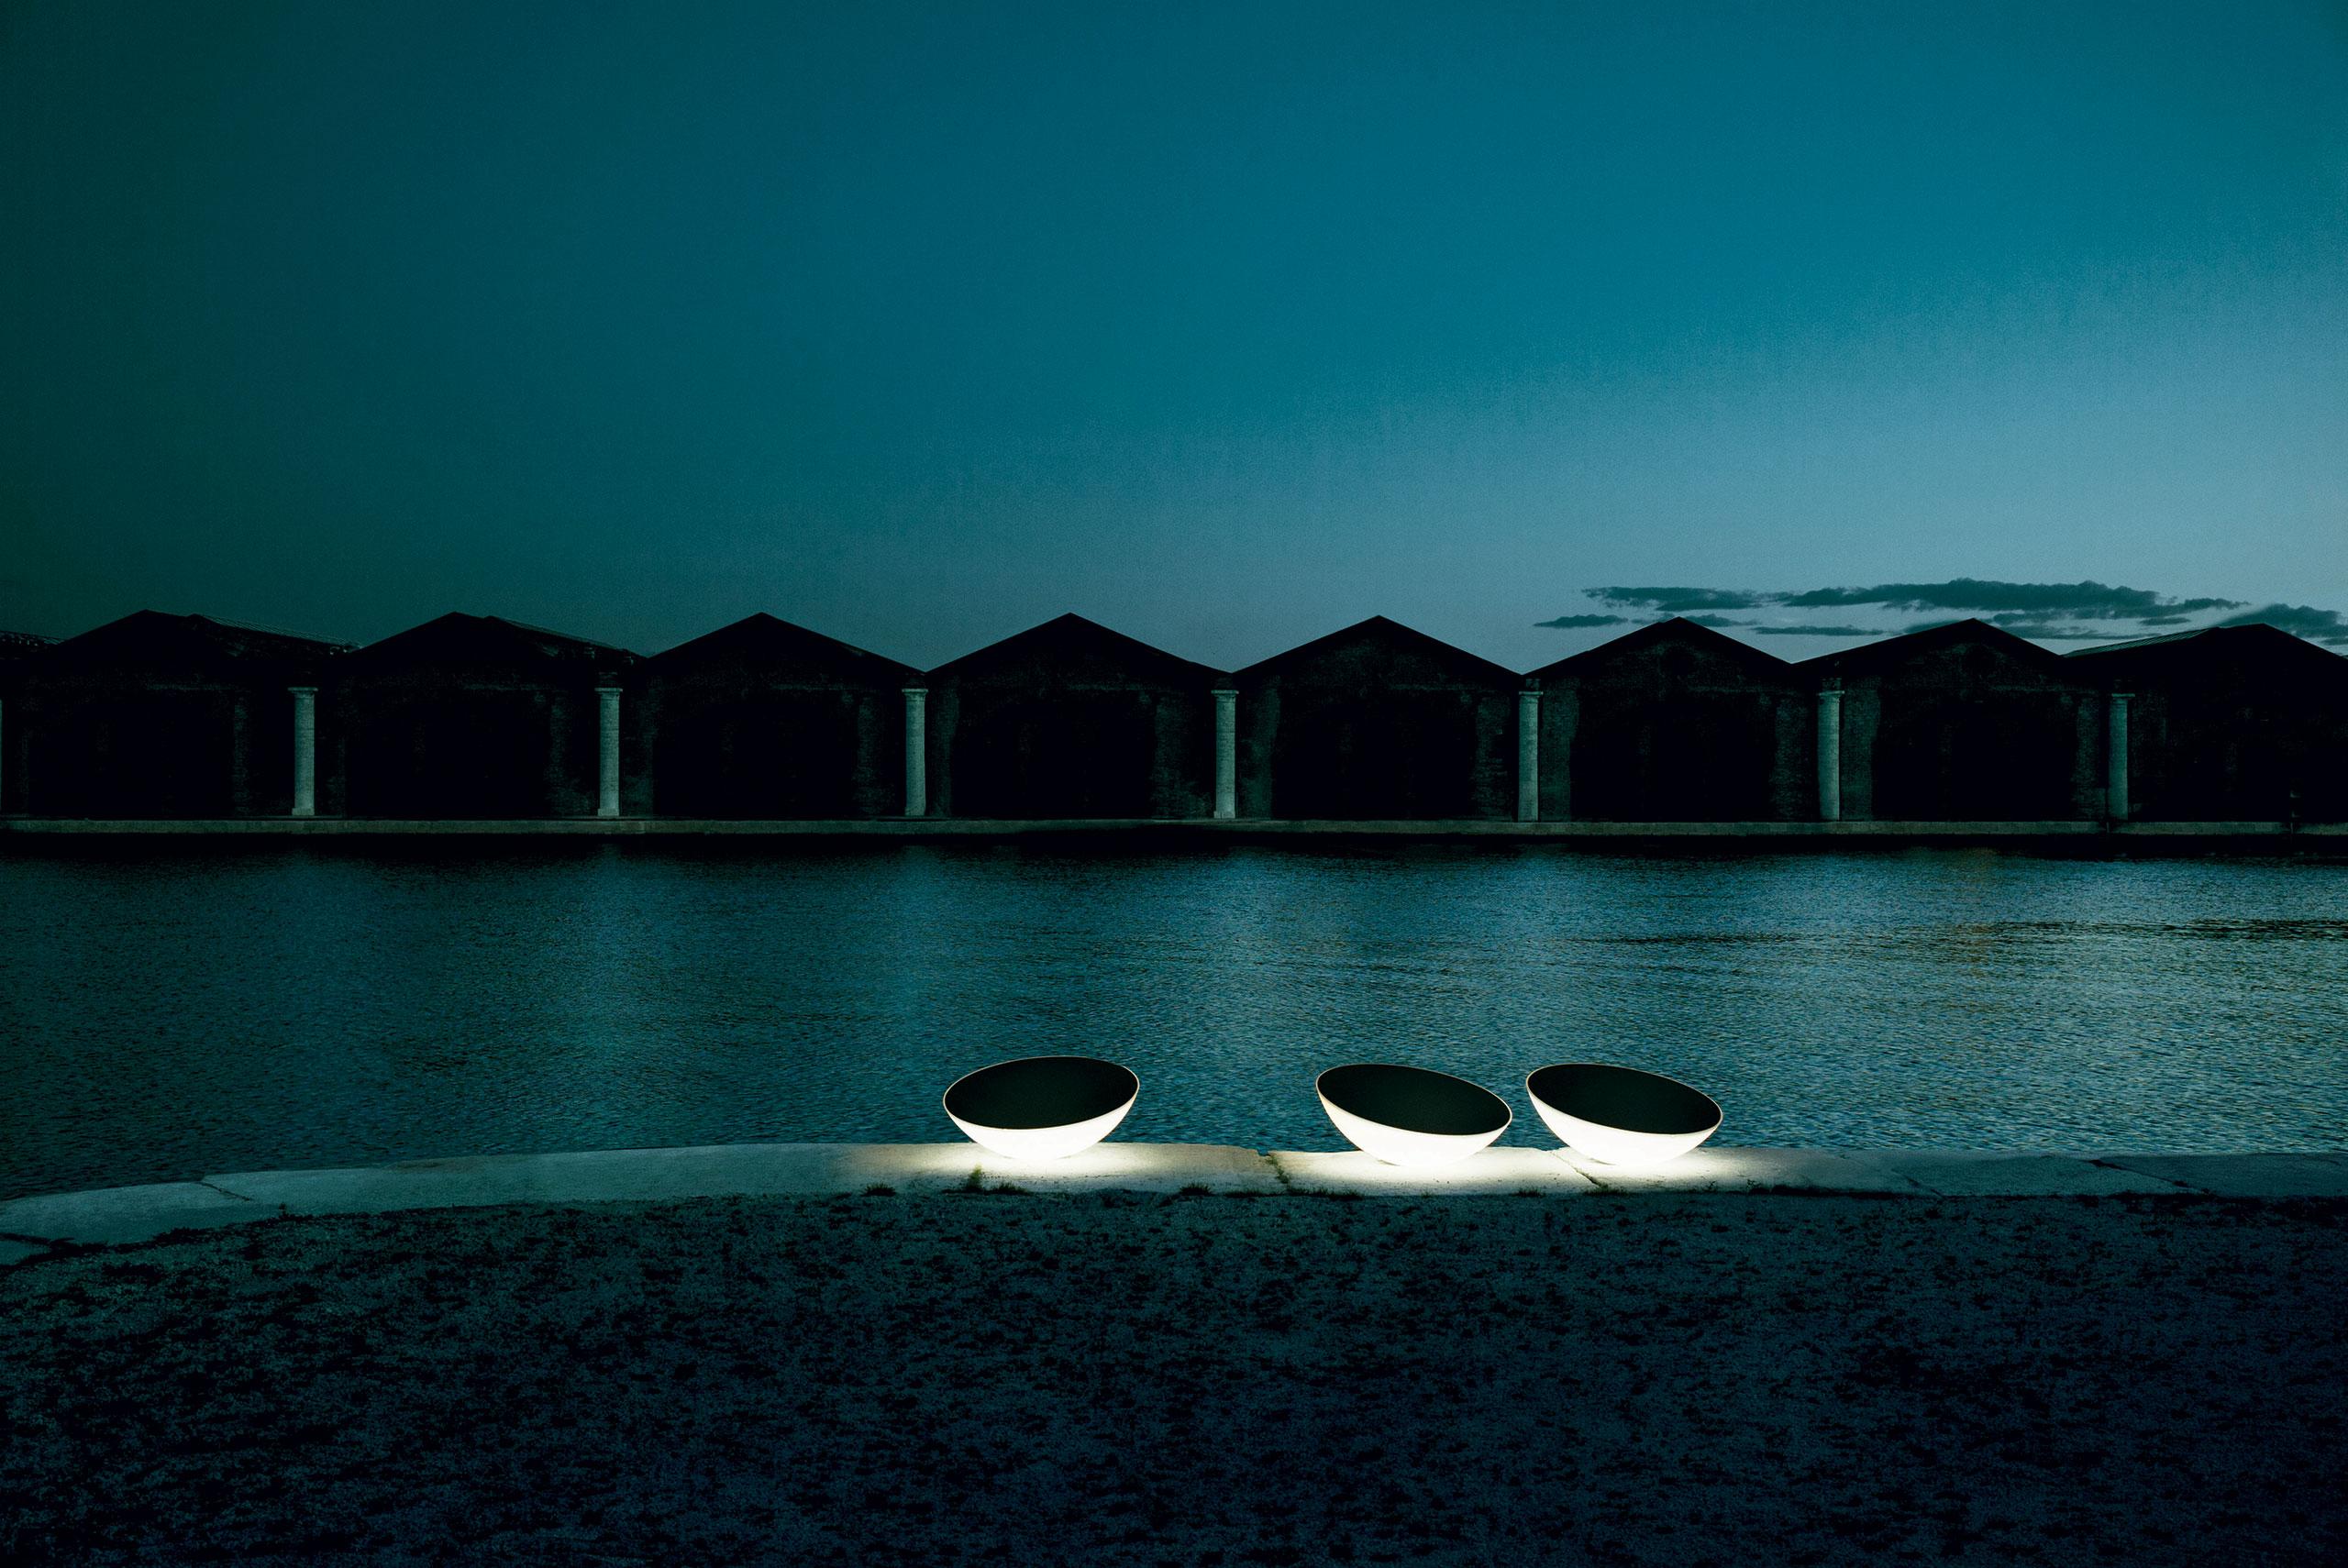 'Solar outdoor' by L+R Palomba, 2011. Photo byTommaso Sartori, © Foscarini, RITRATTI-volume 1.